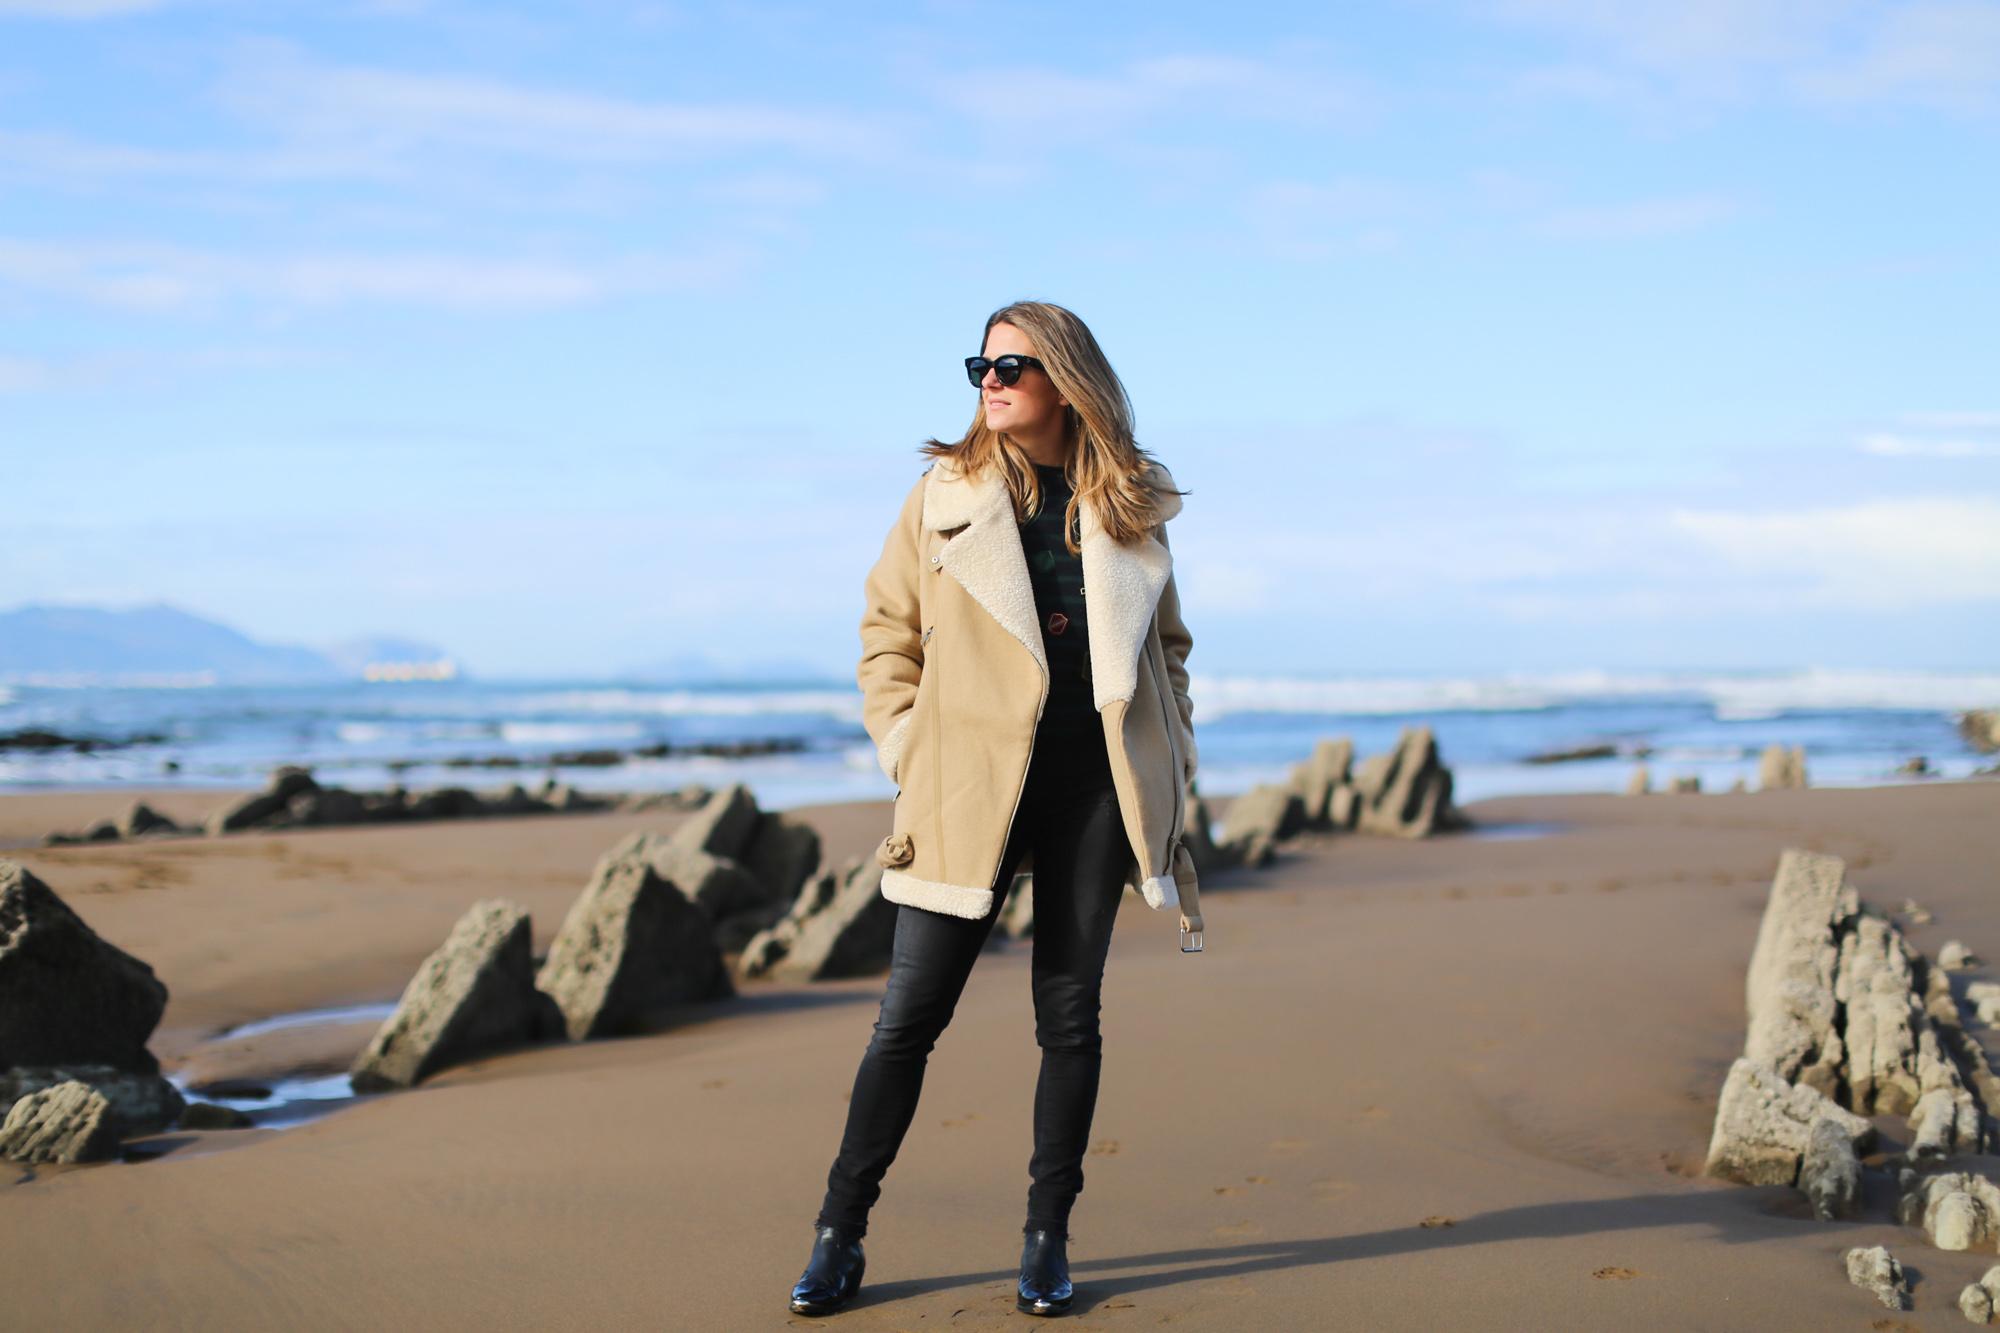 Clochet_streetstyle_fashionblogger_aviatorsherlingjacket_abrigoabiadorzara_botines_topshoparson-4